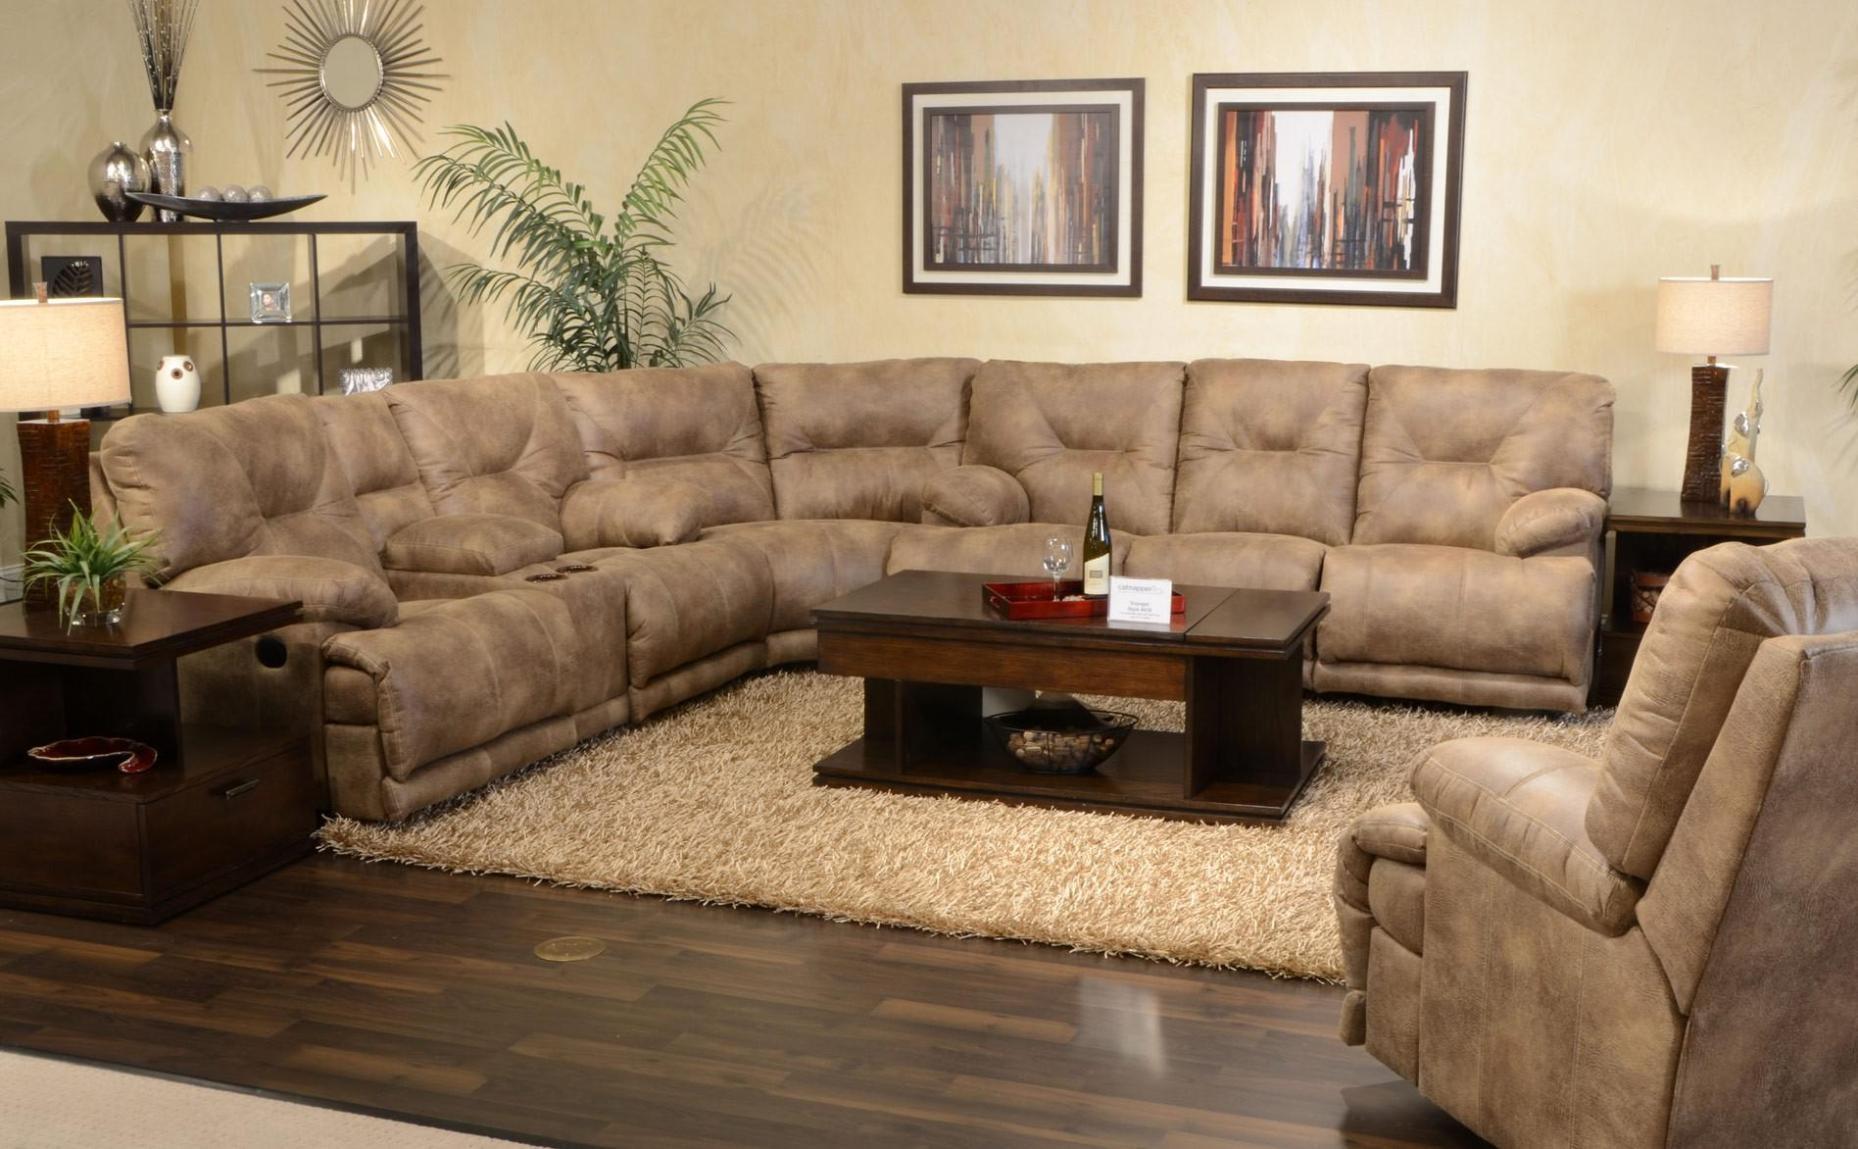 Sofa : Amazing Braxton Sectional Sofa Beautiful Home Design Regarding Braxton Sectional Sofas (Image 20 of 20)